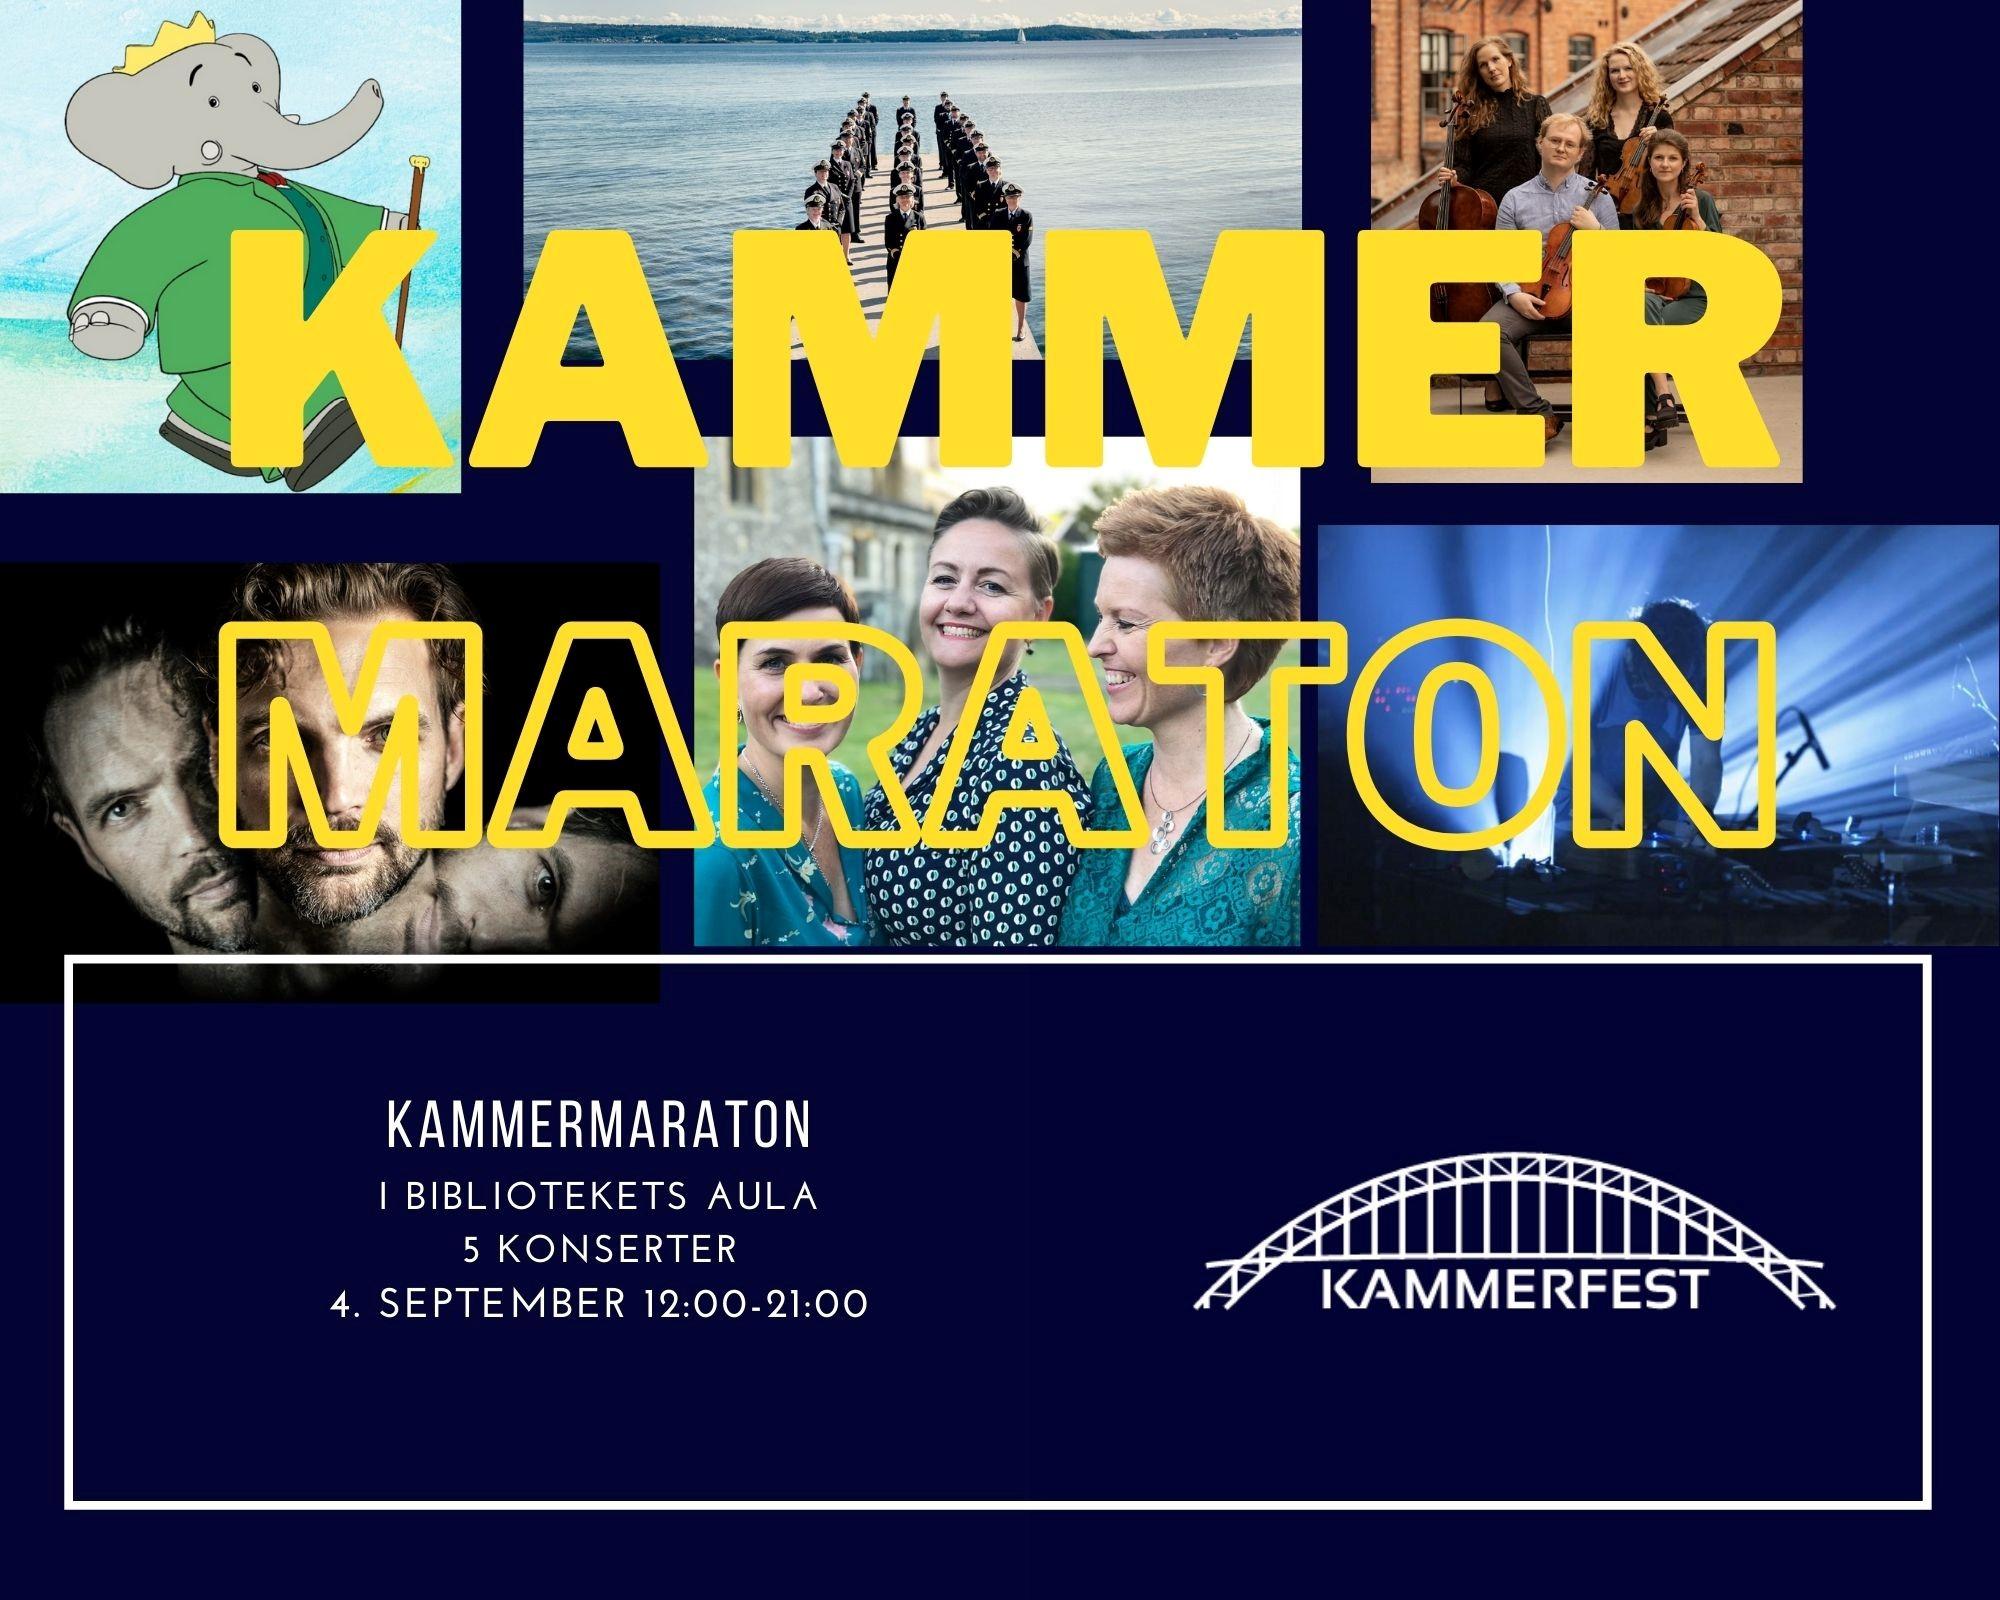 Kammermaraton